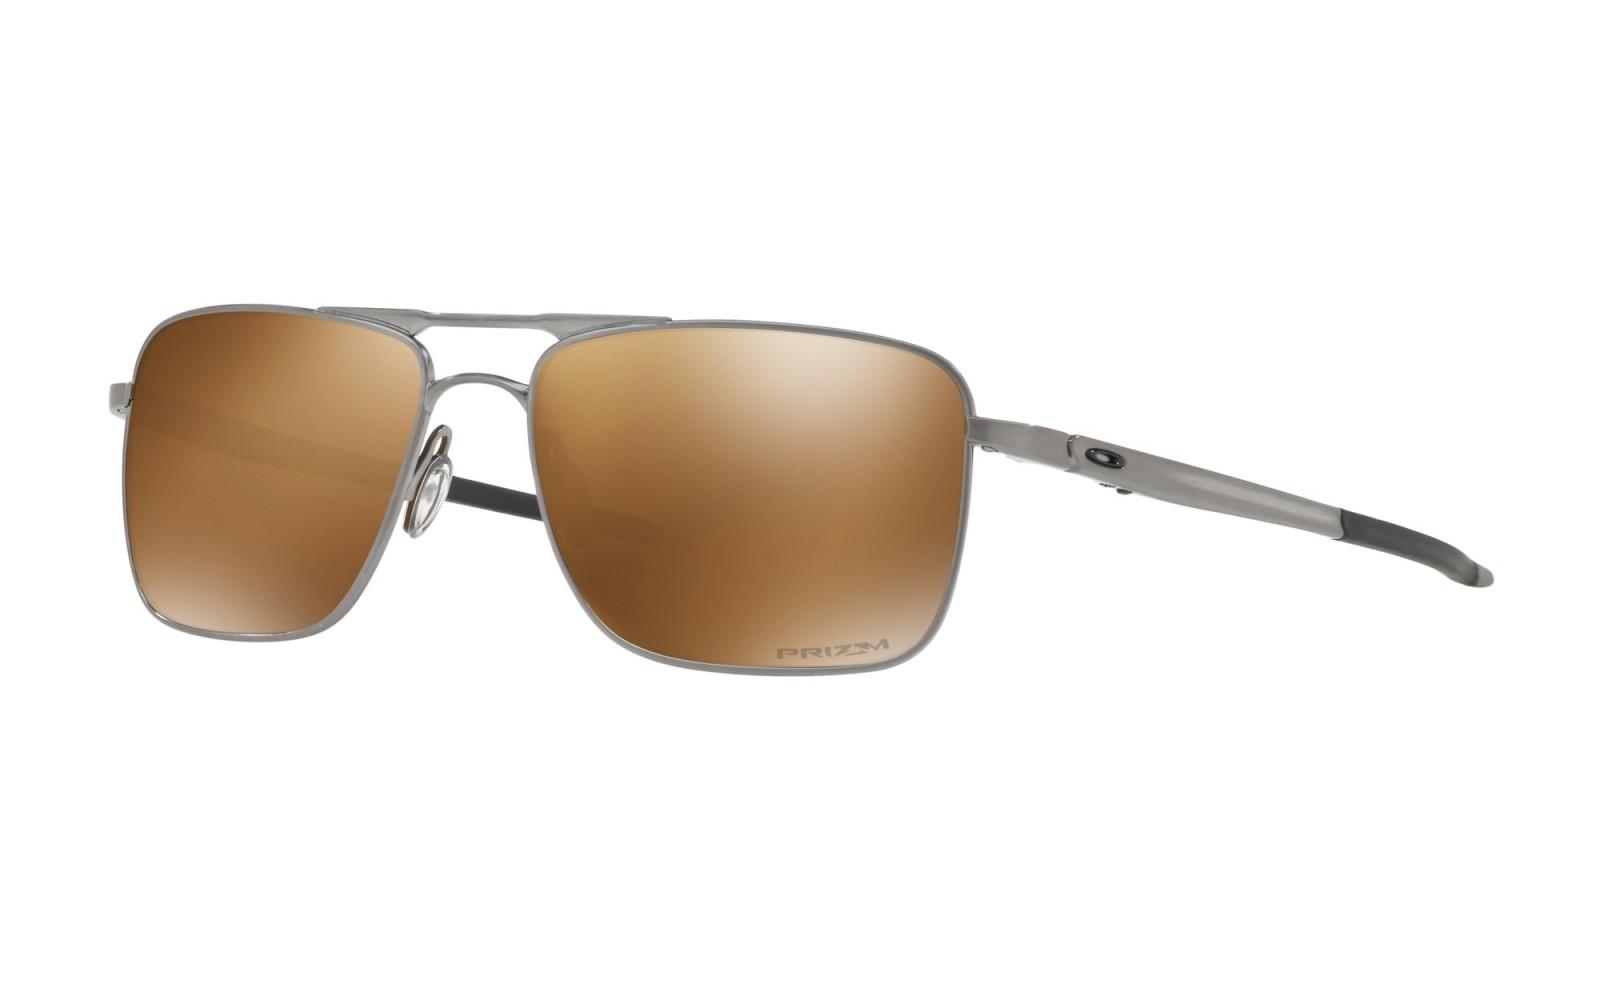 Oakley Gauge 6 - Satin Chrome / Prizm Tungsten Polarized - OO6038-0557 Zonnebril